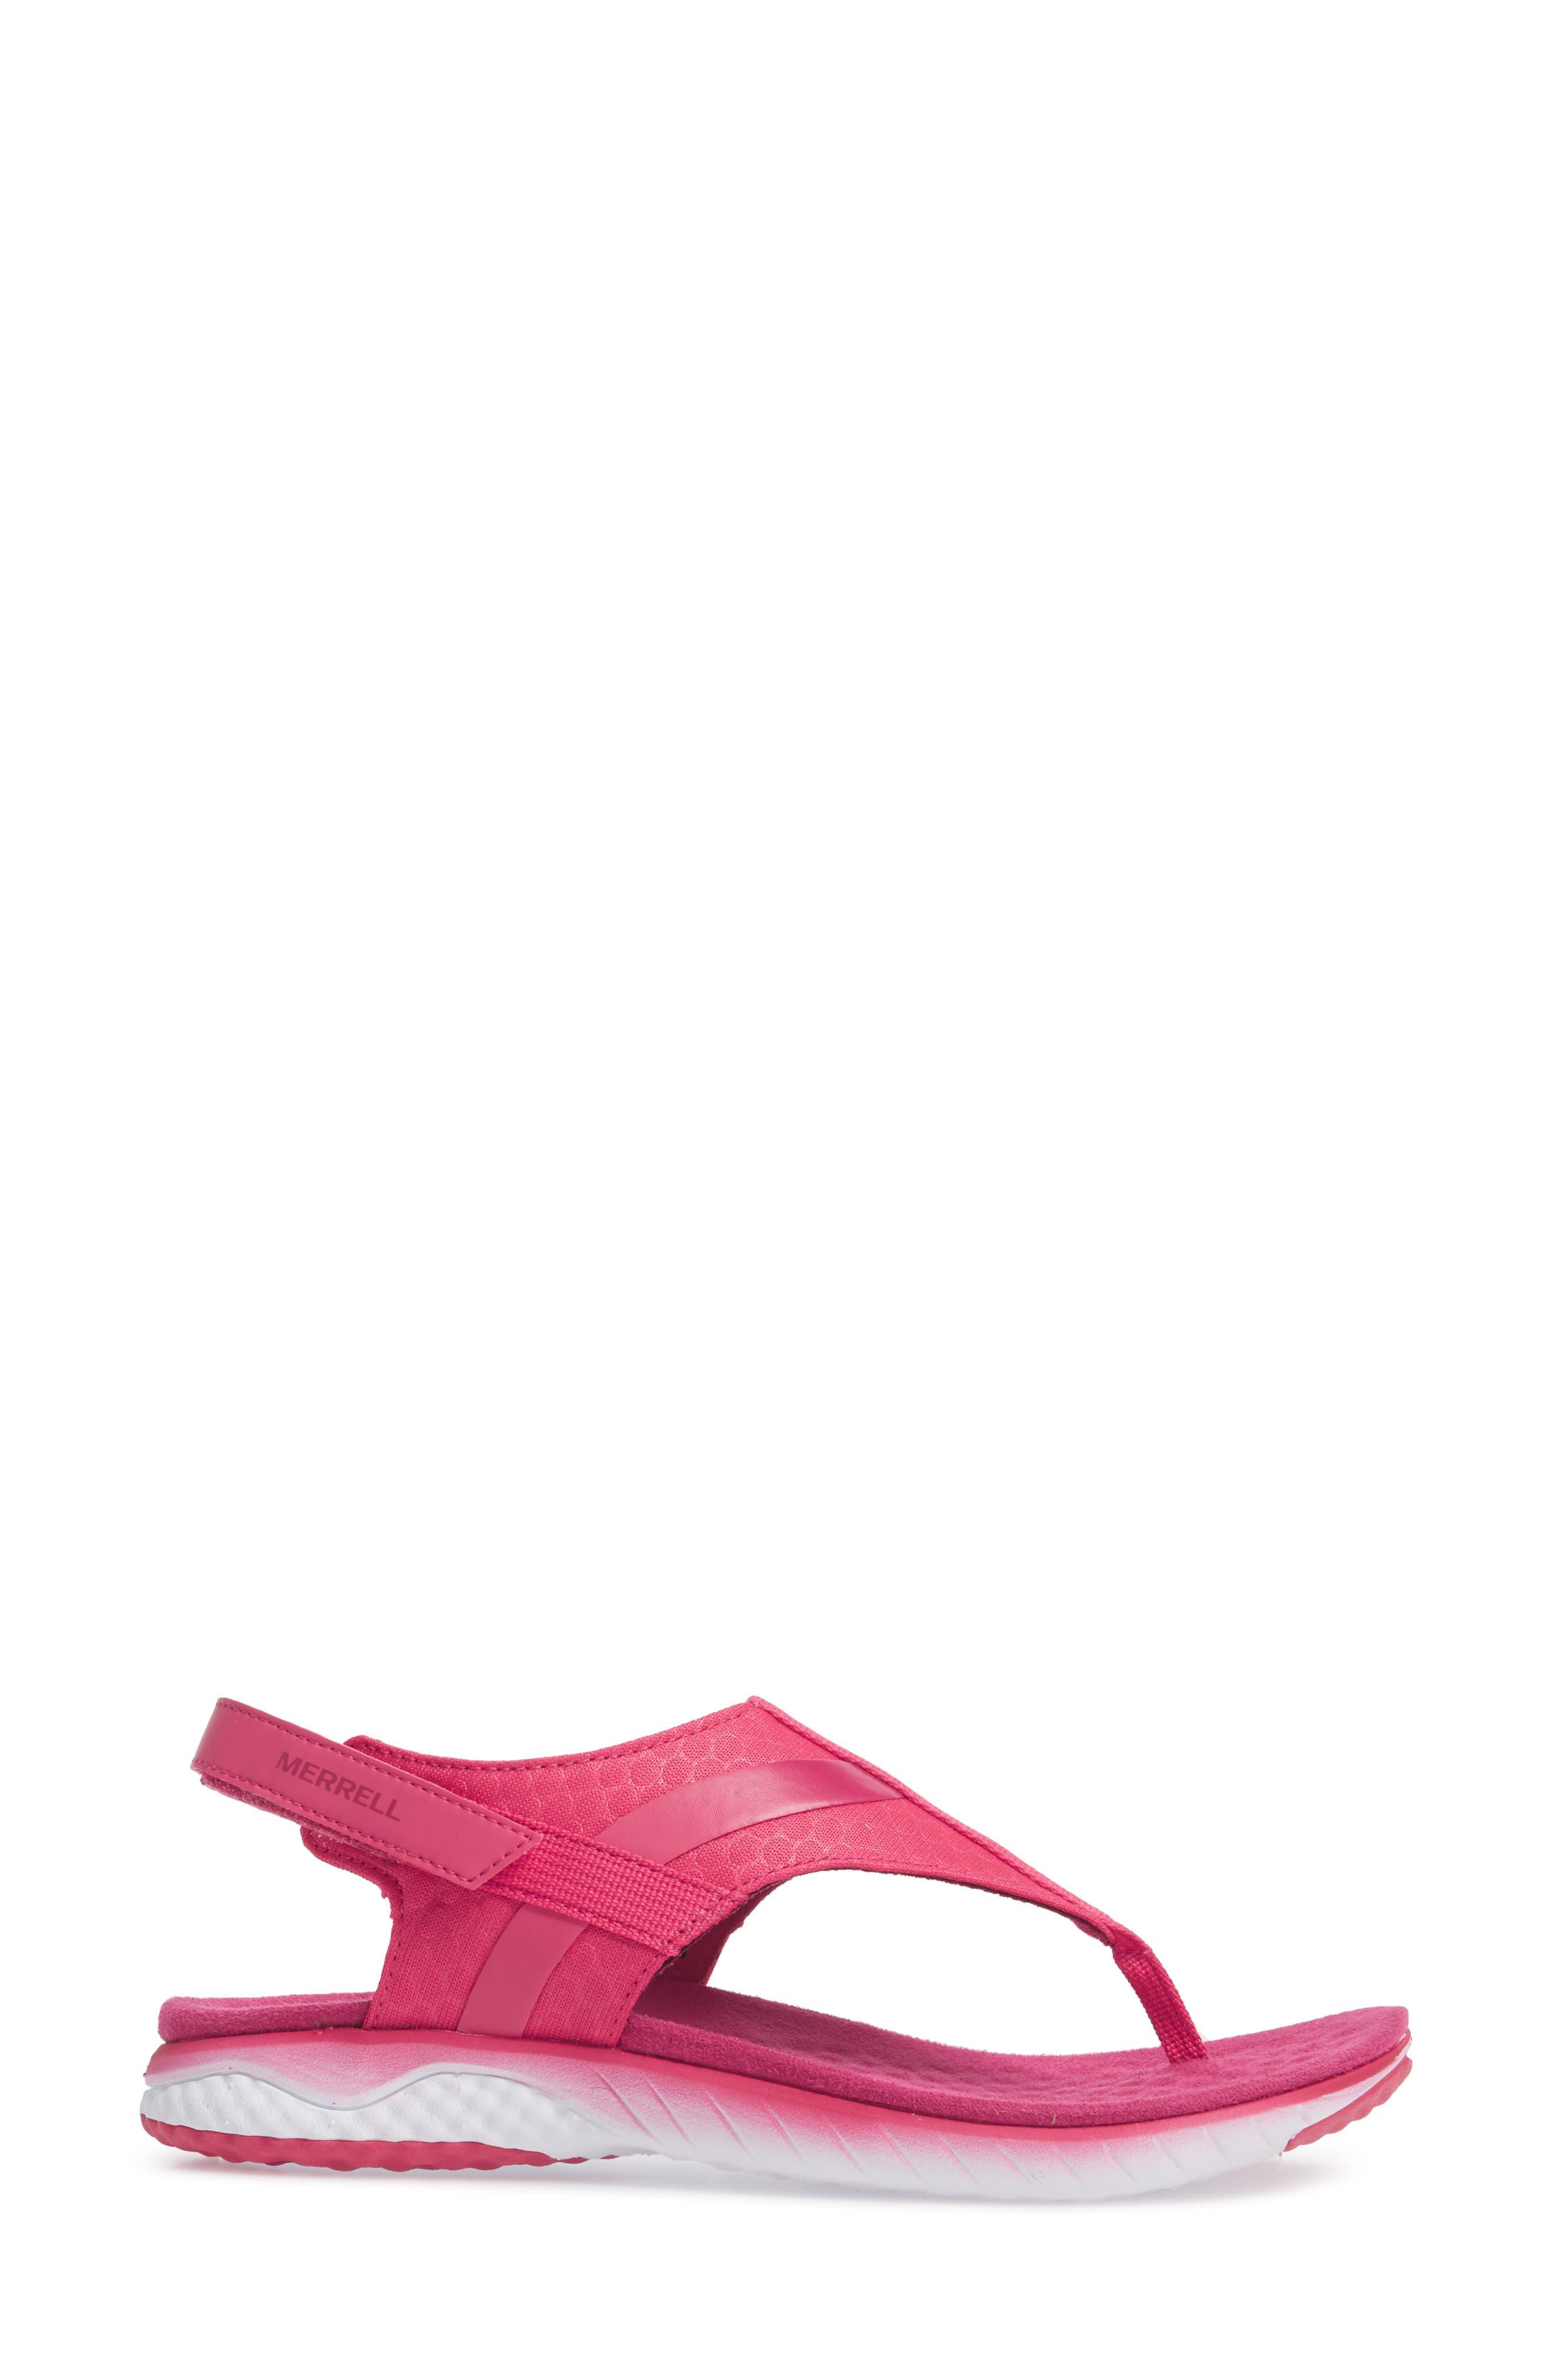 1SIX8 Linna Slide Air Cushion+ Sandal,                             Alternate thumbnail 12, color,